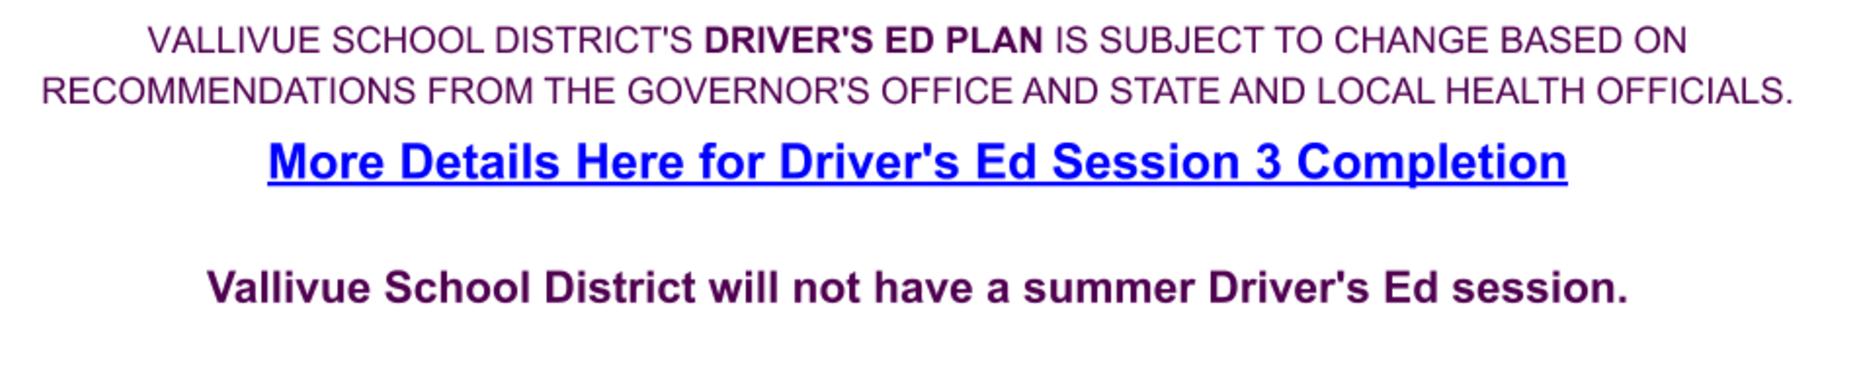 Driver's Ed Update